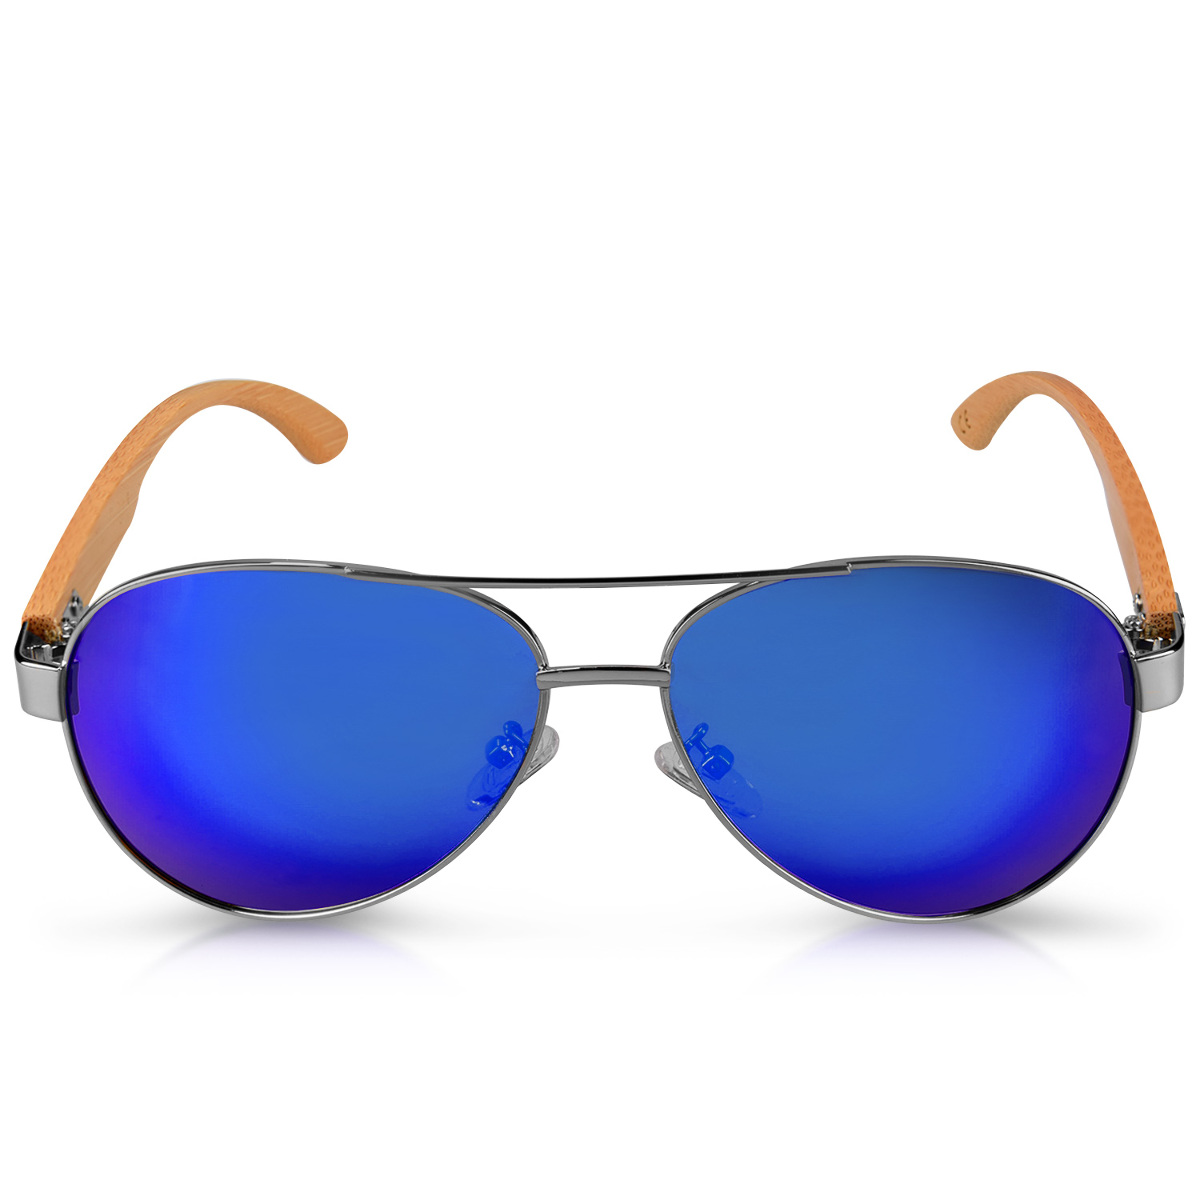 Gafas-de-sol-estilo-aviador-polarizadas-UV400-con-patillas-de-bambu